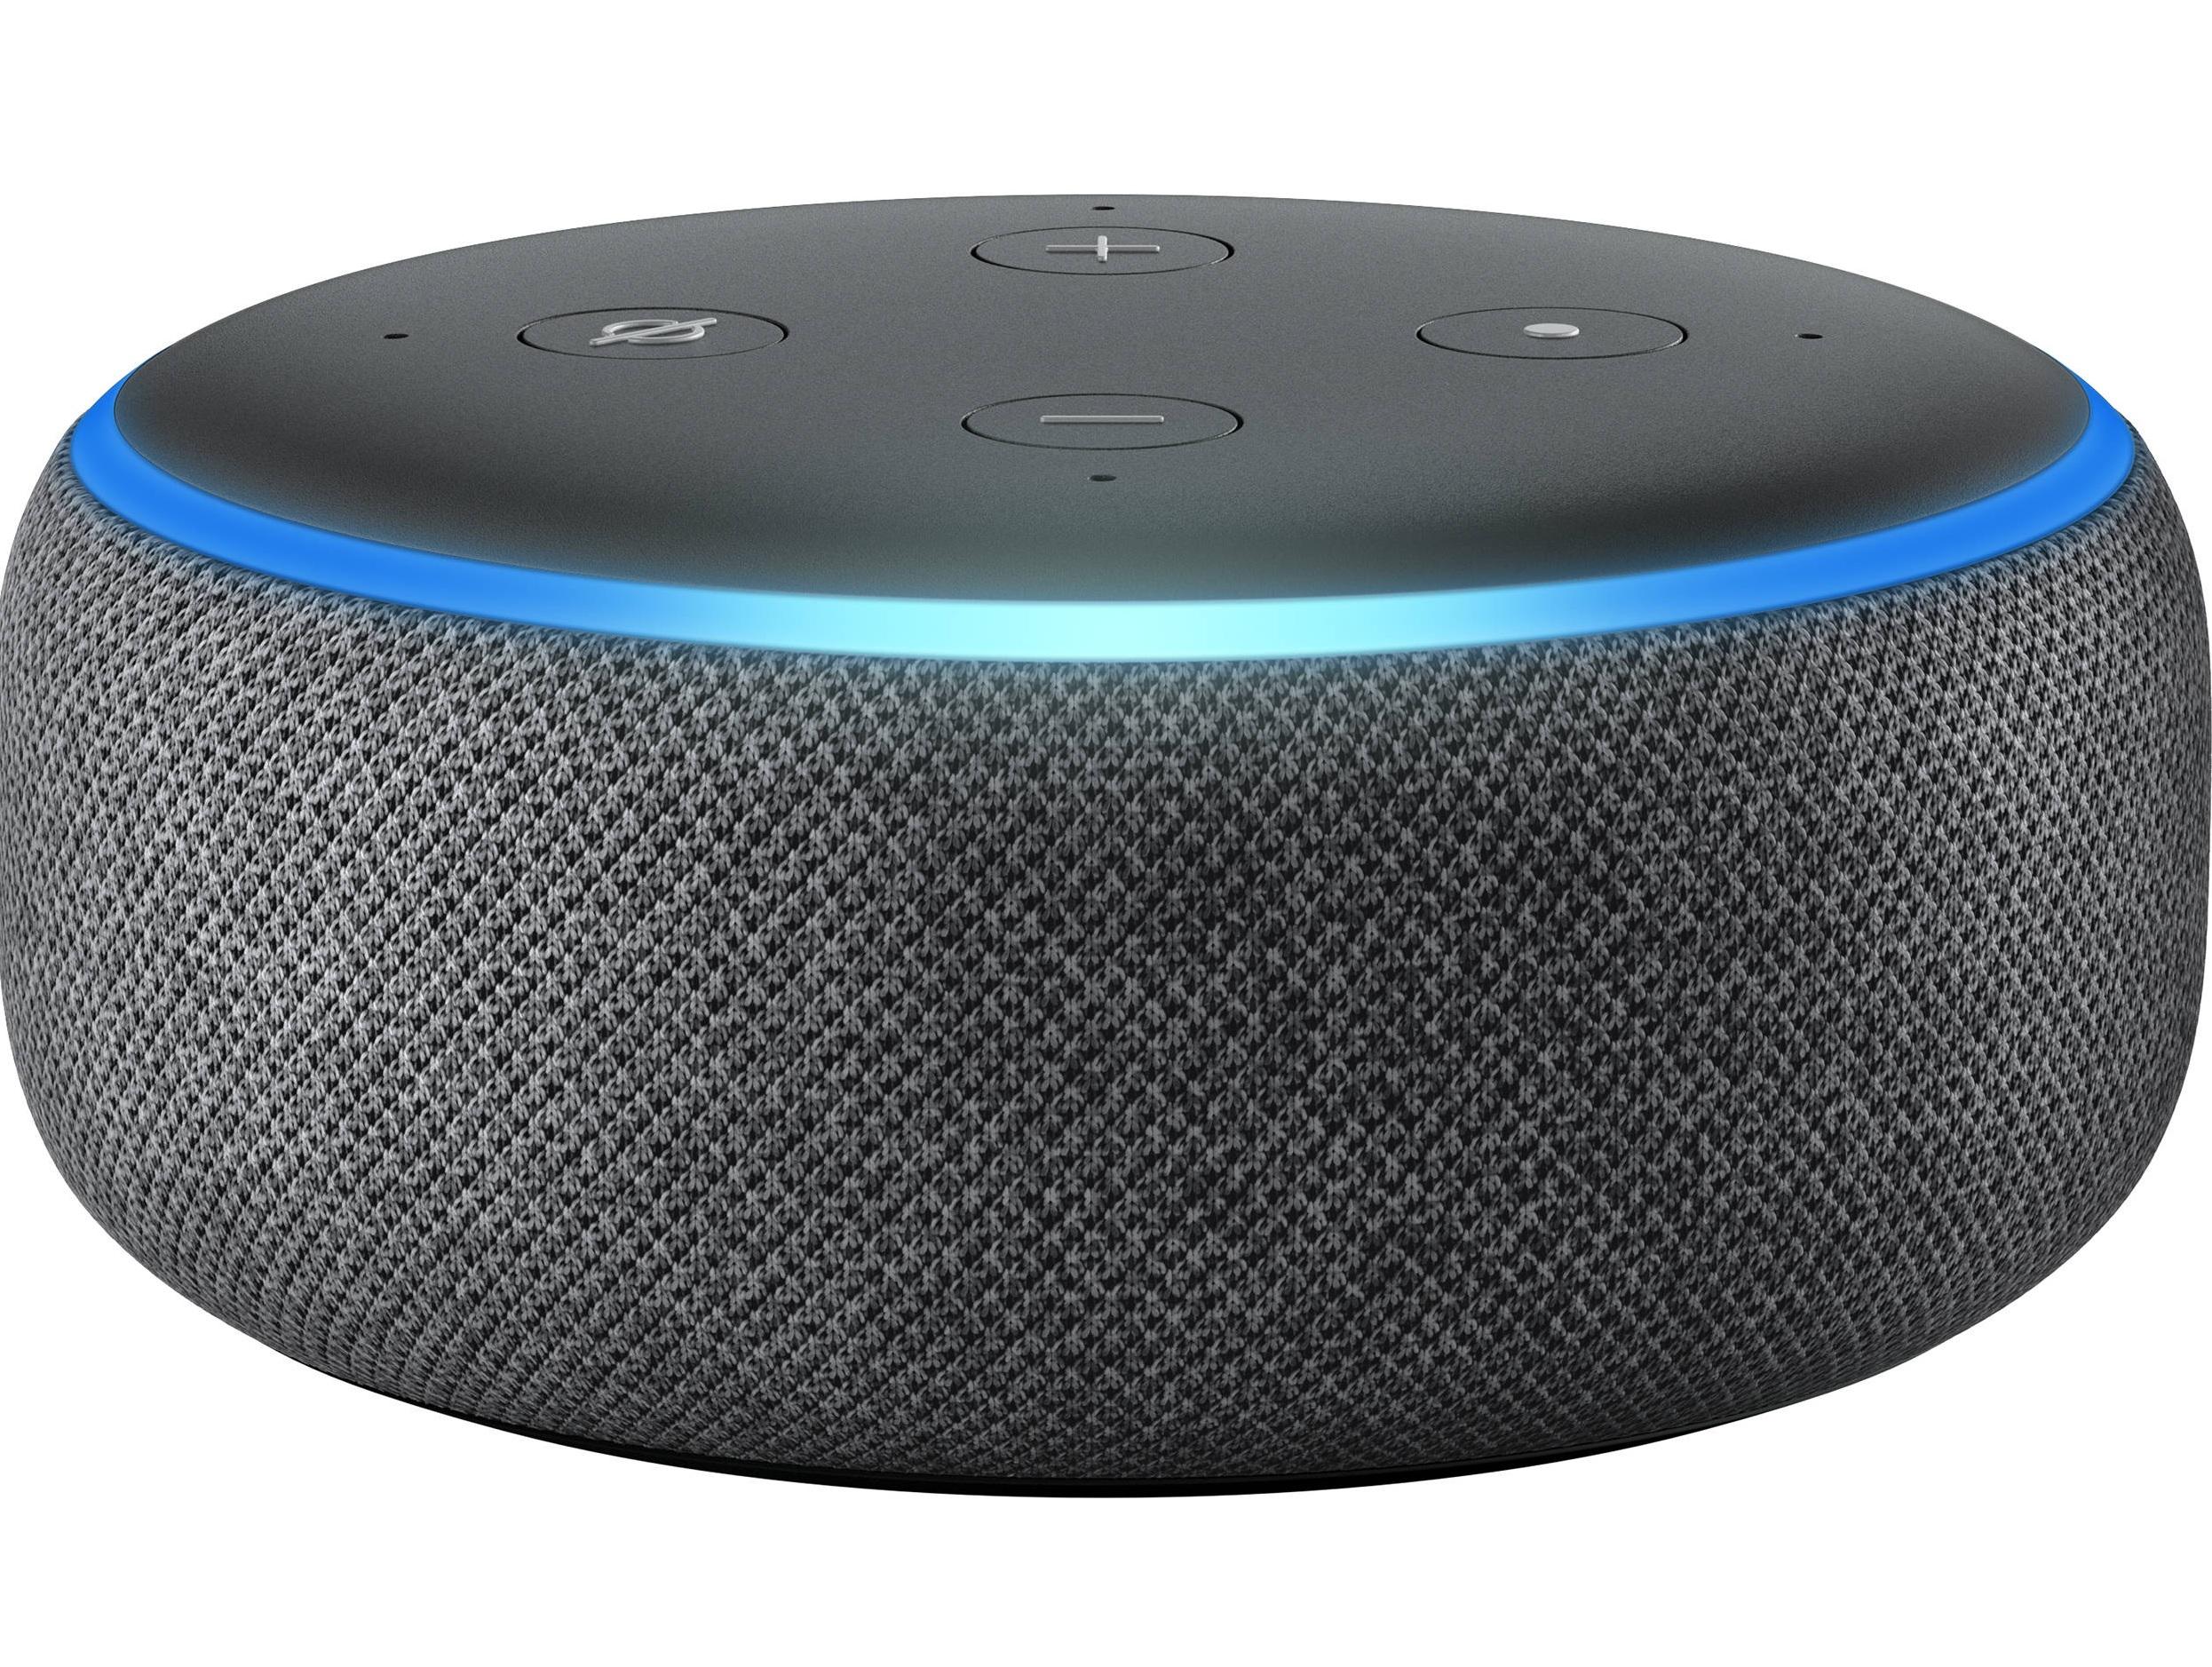 amazon echo dot tech gifts for dad